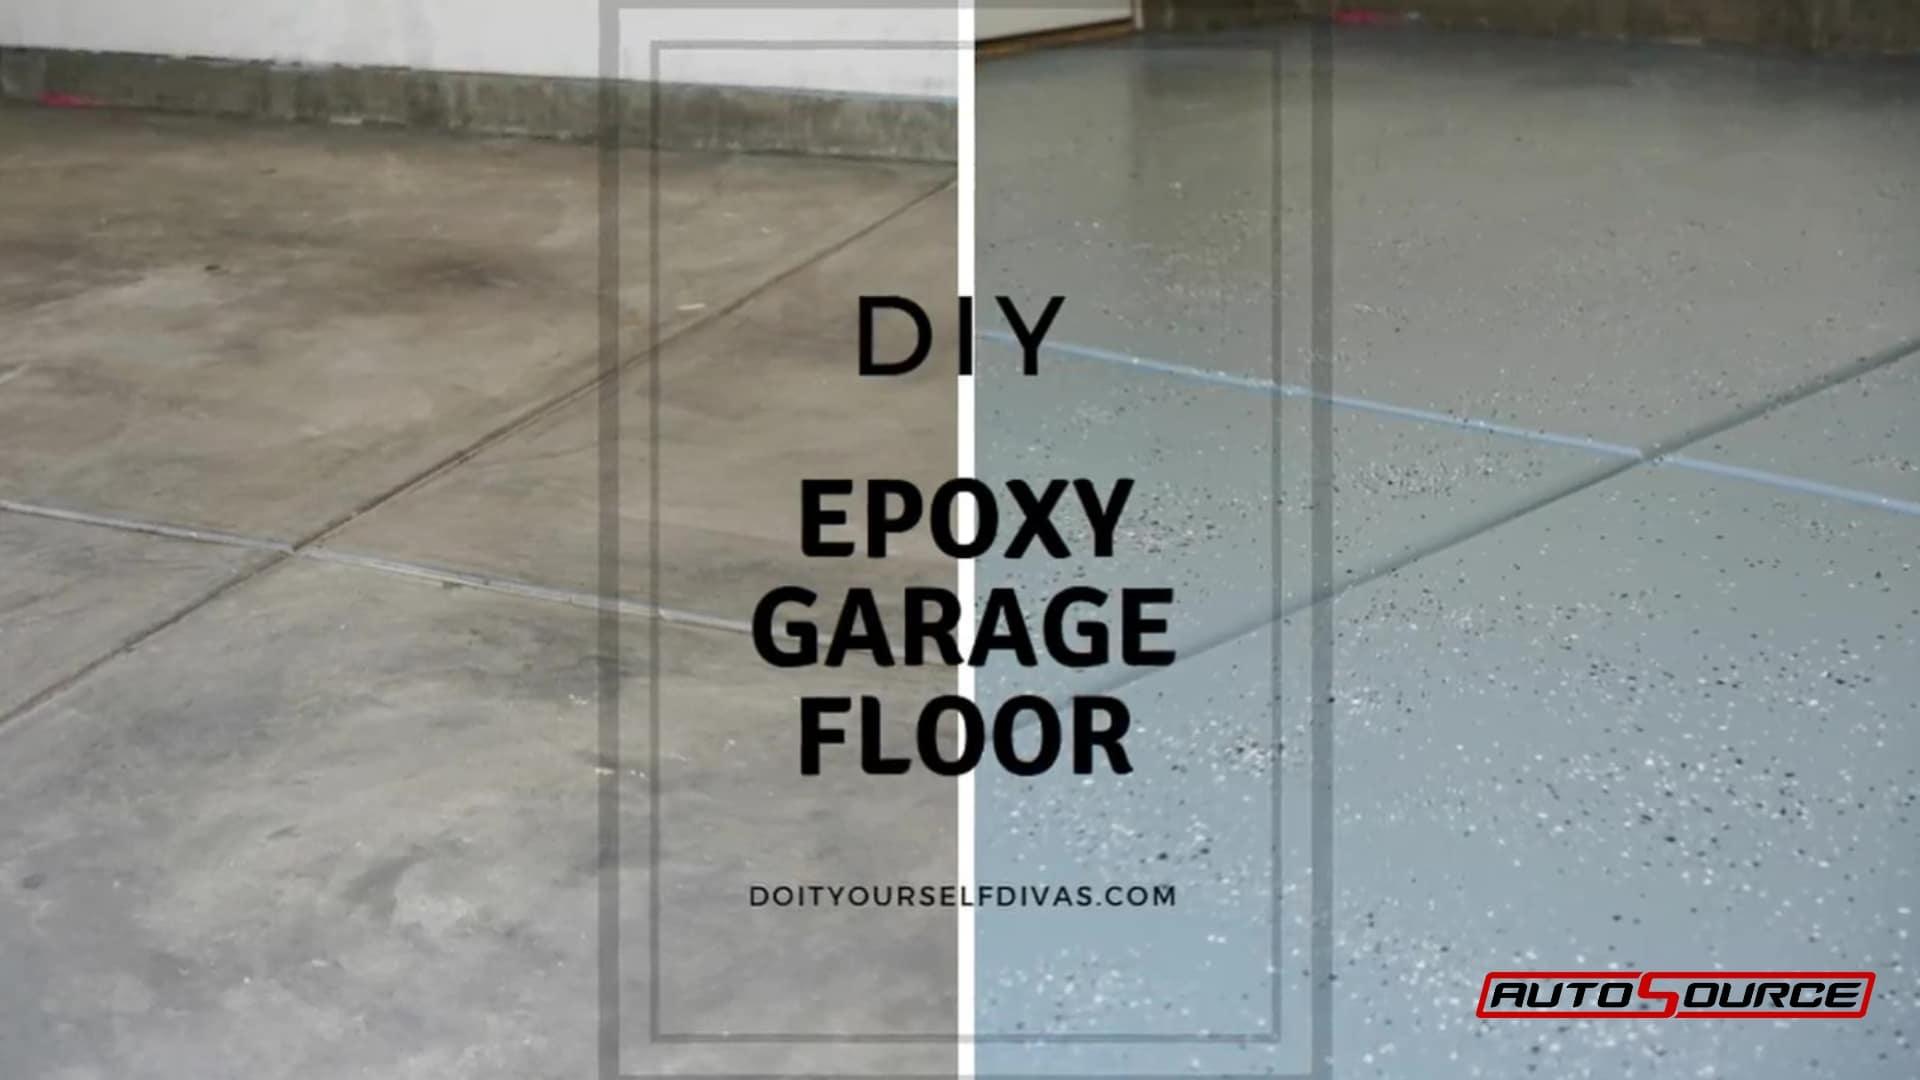 Diy Epoxy Garage Floor Diy Divas Autosource